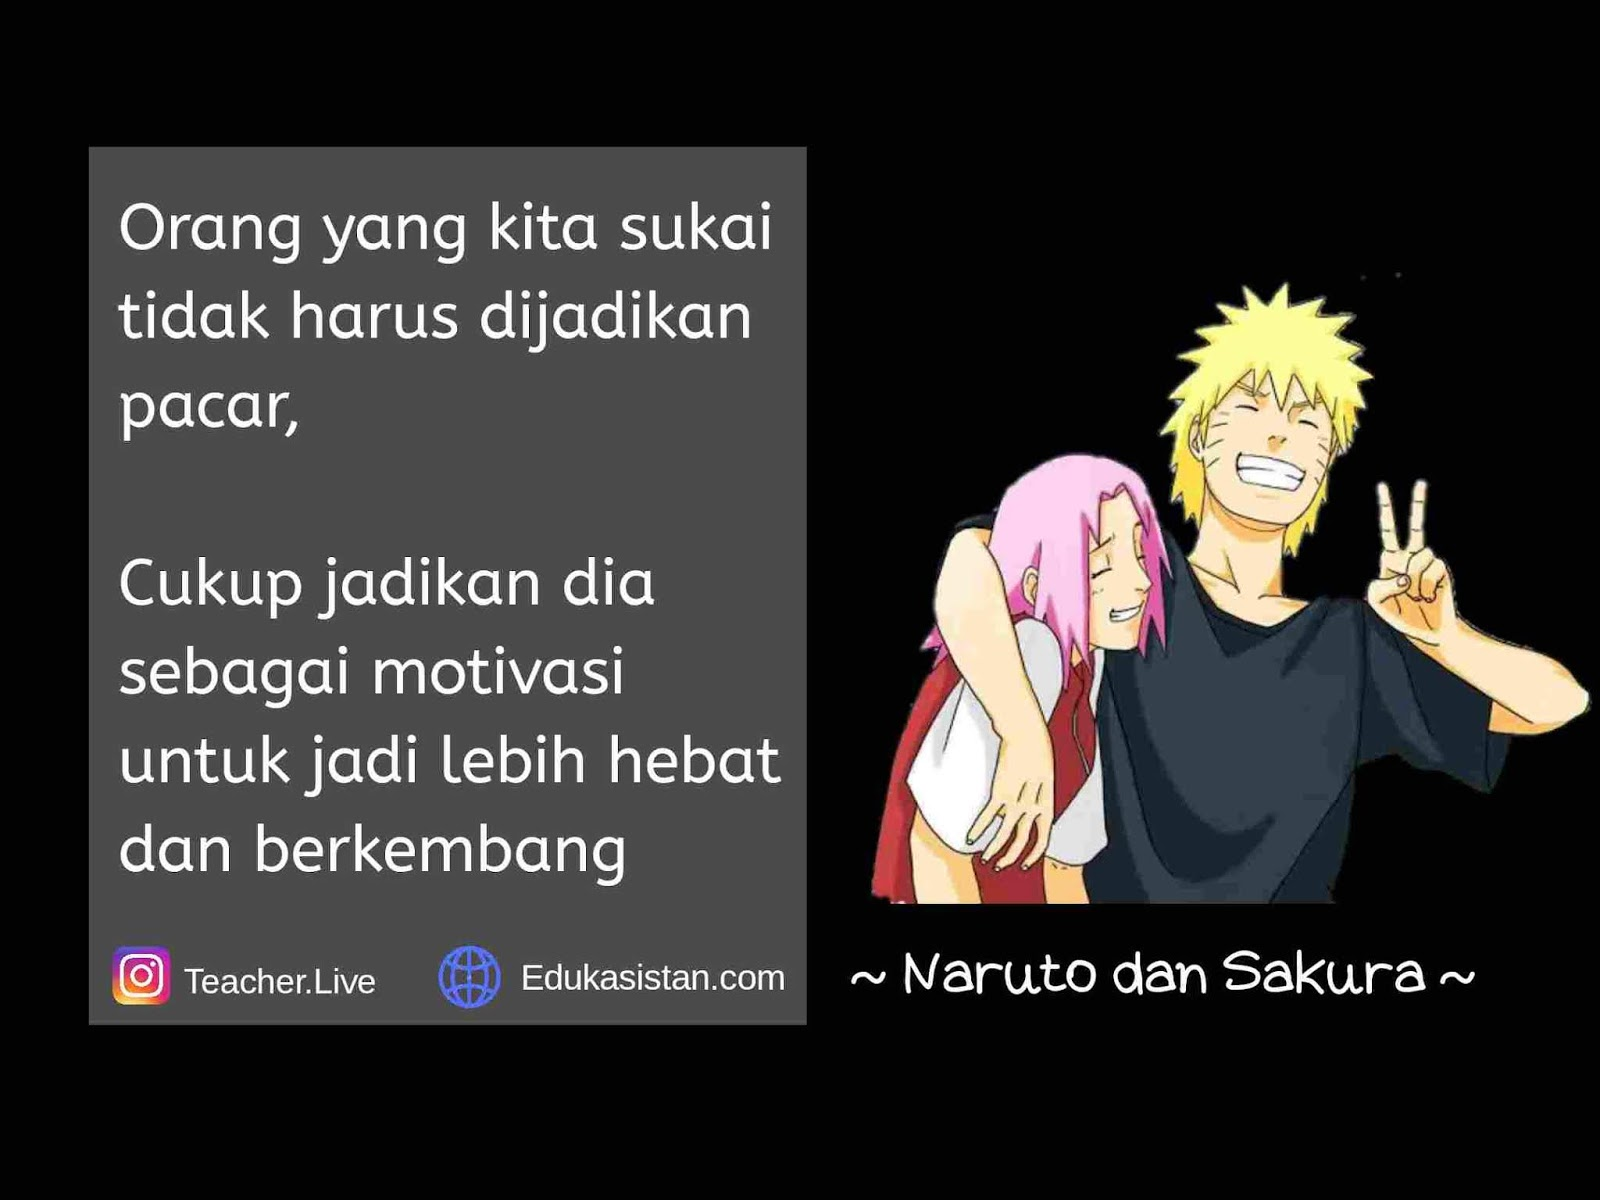 30 Kata Kata Bijak Bergambar Anime Naruto Edukasistan Com